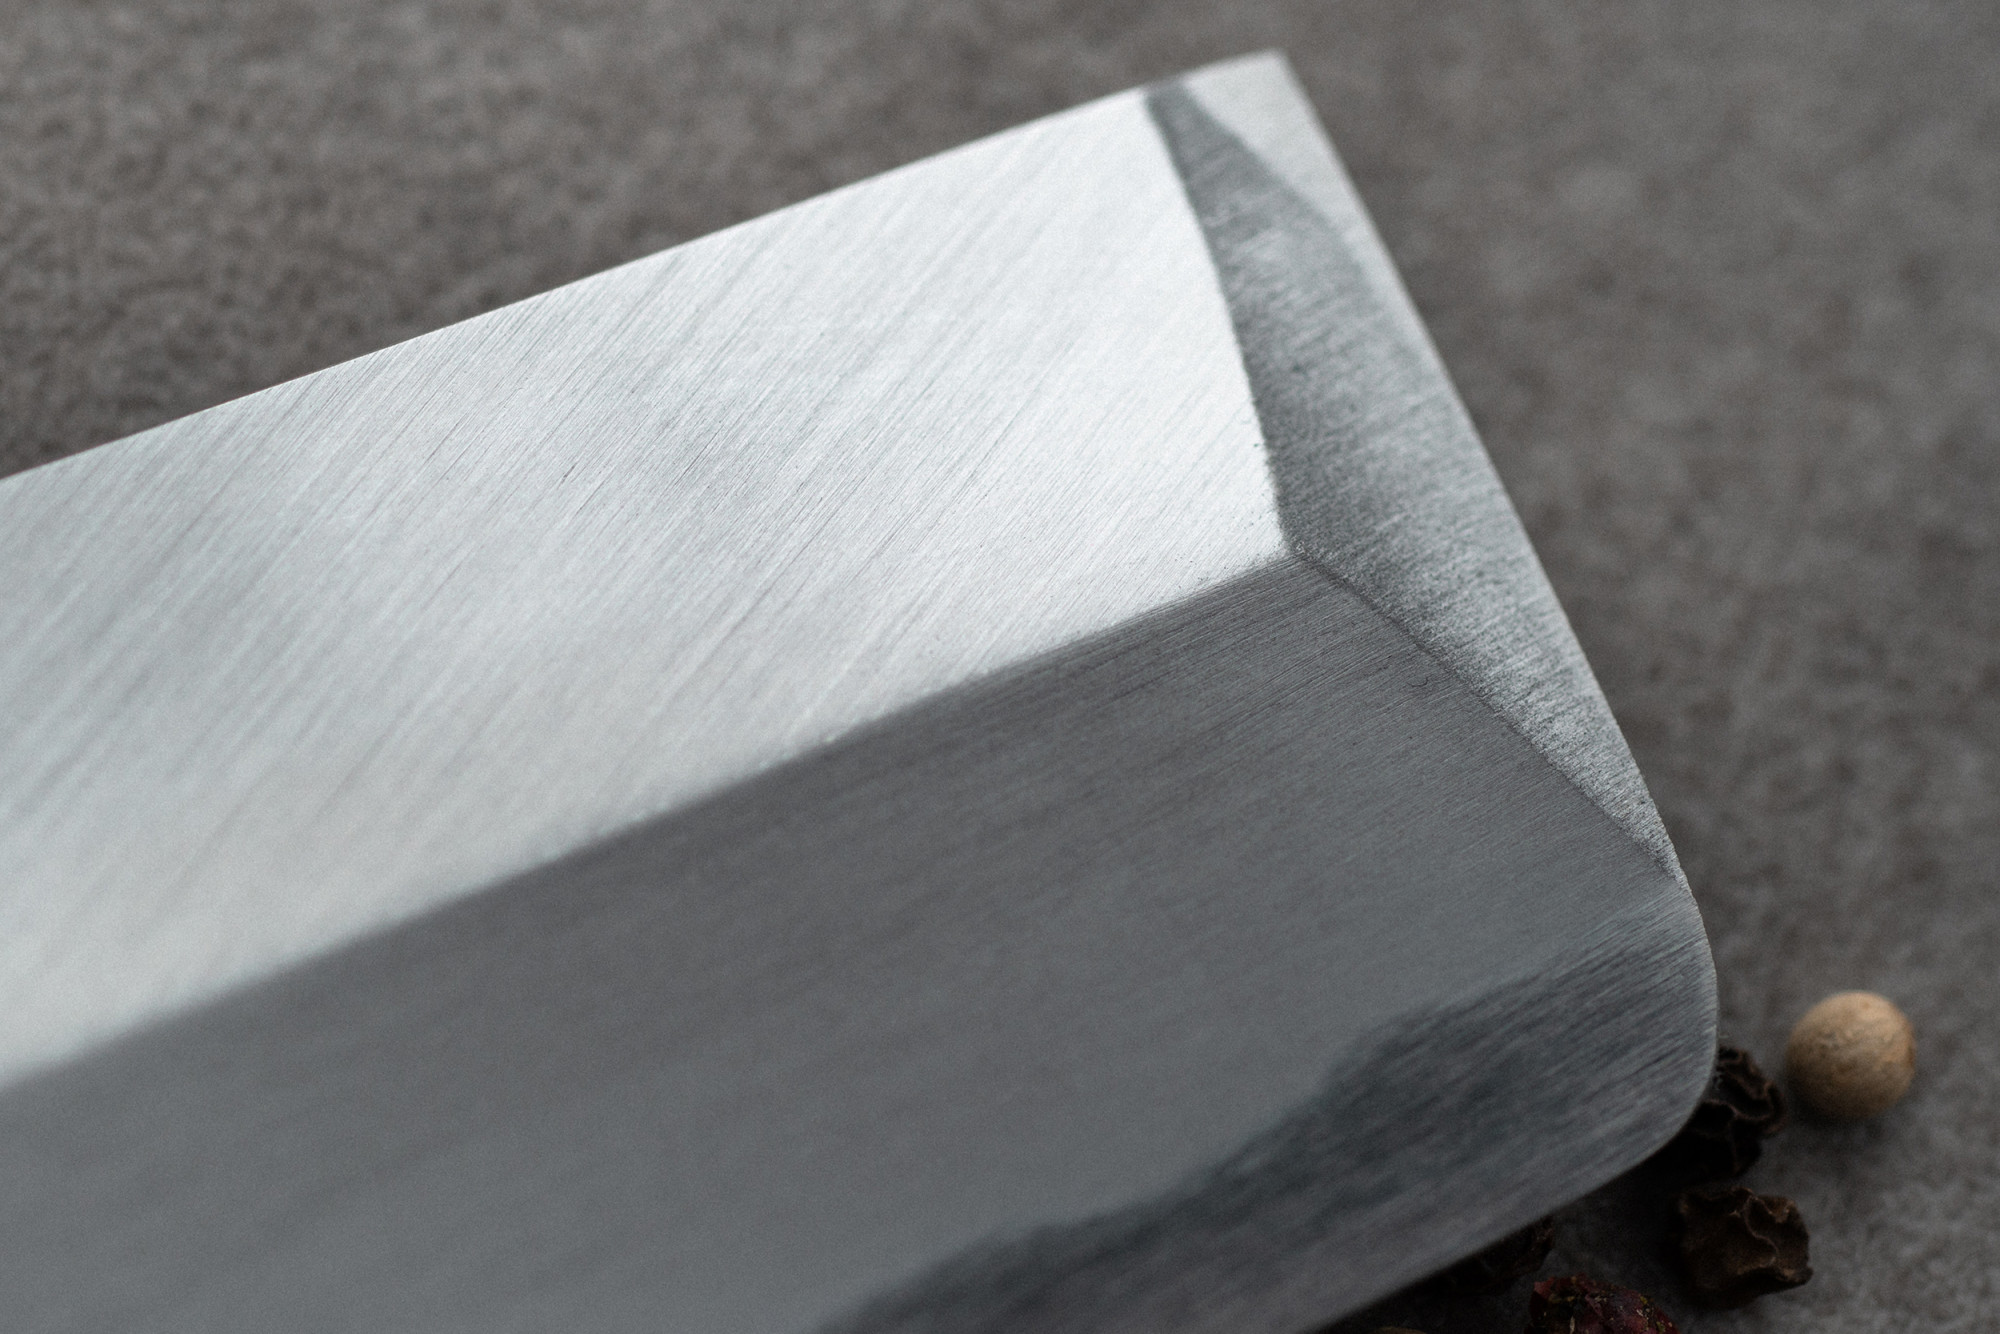 Sakai Takayuki Usuba 180mm Tokojou White Steel 2 japanese kitchen knives